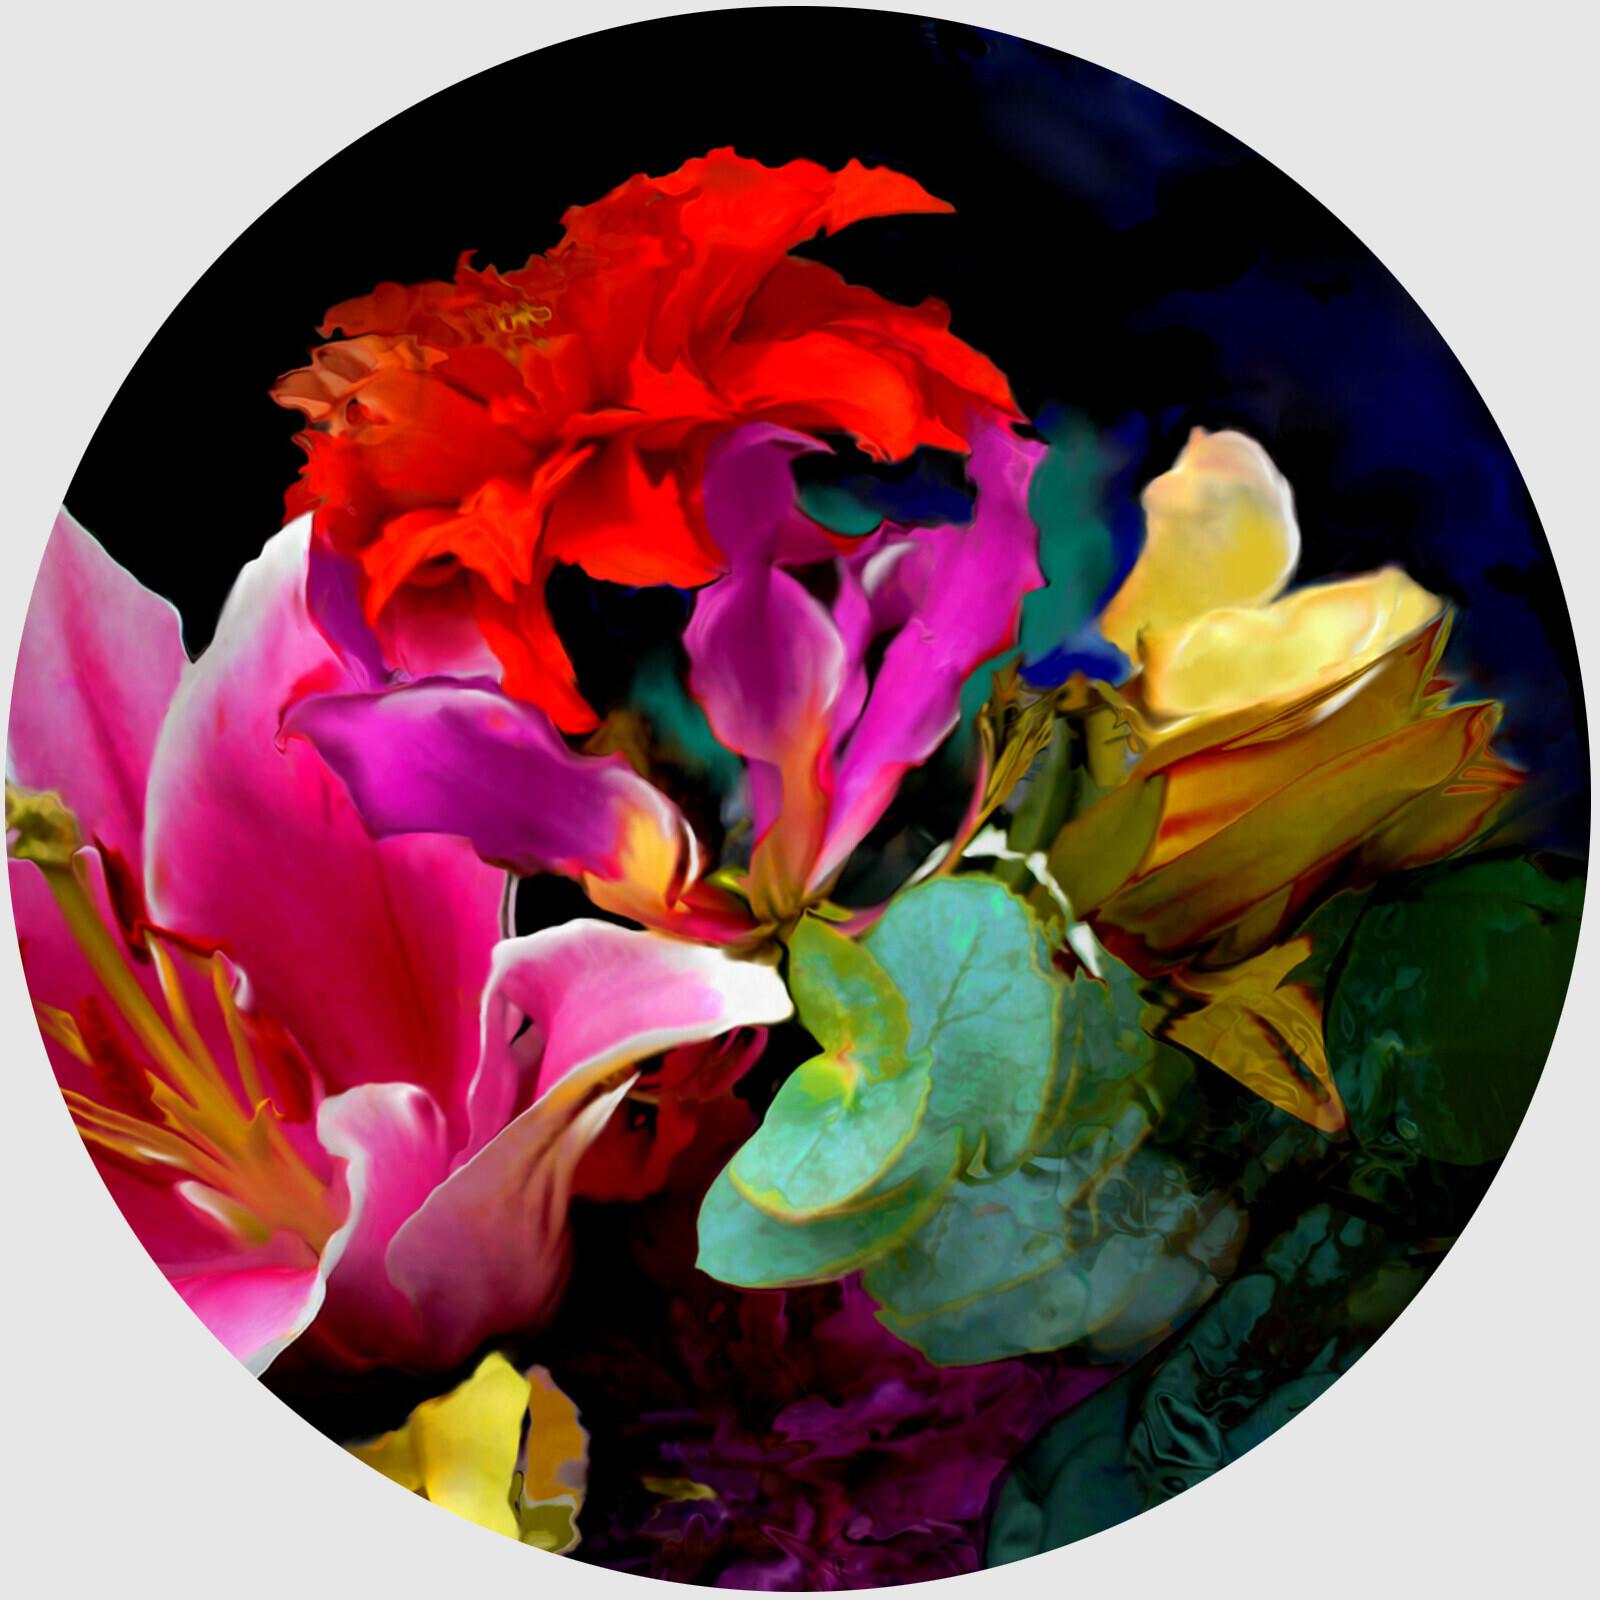 """bloom v7.1"" - René Twigge"